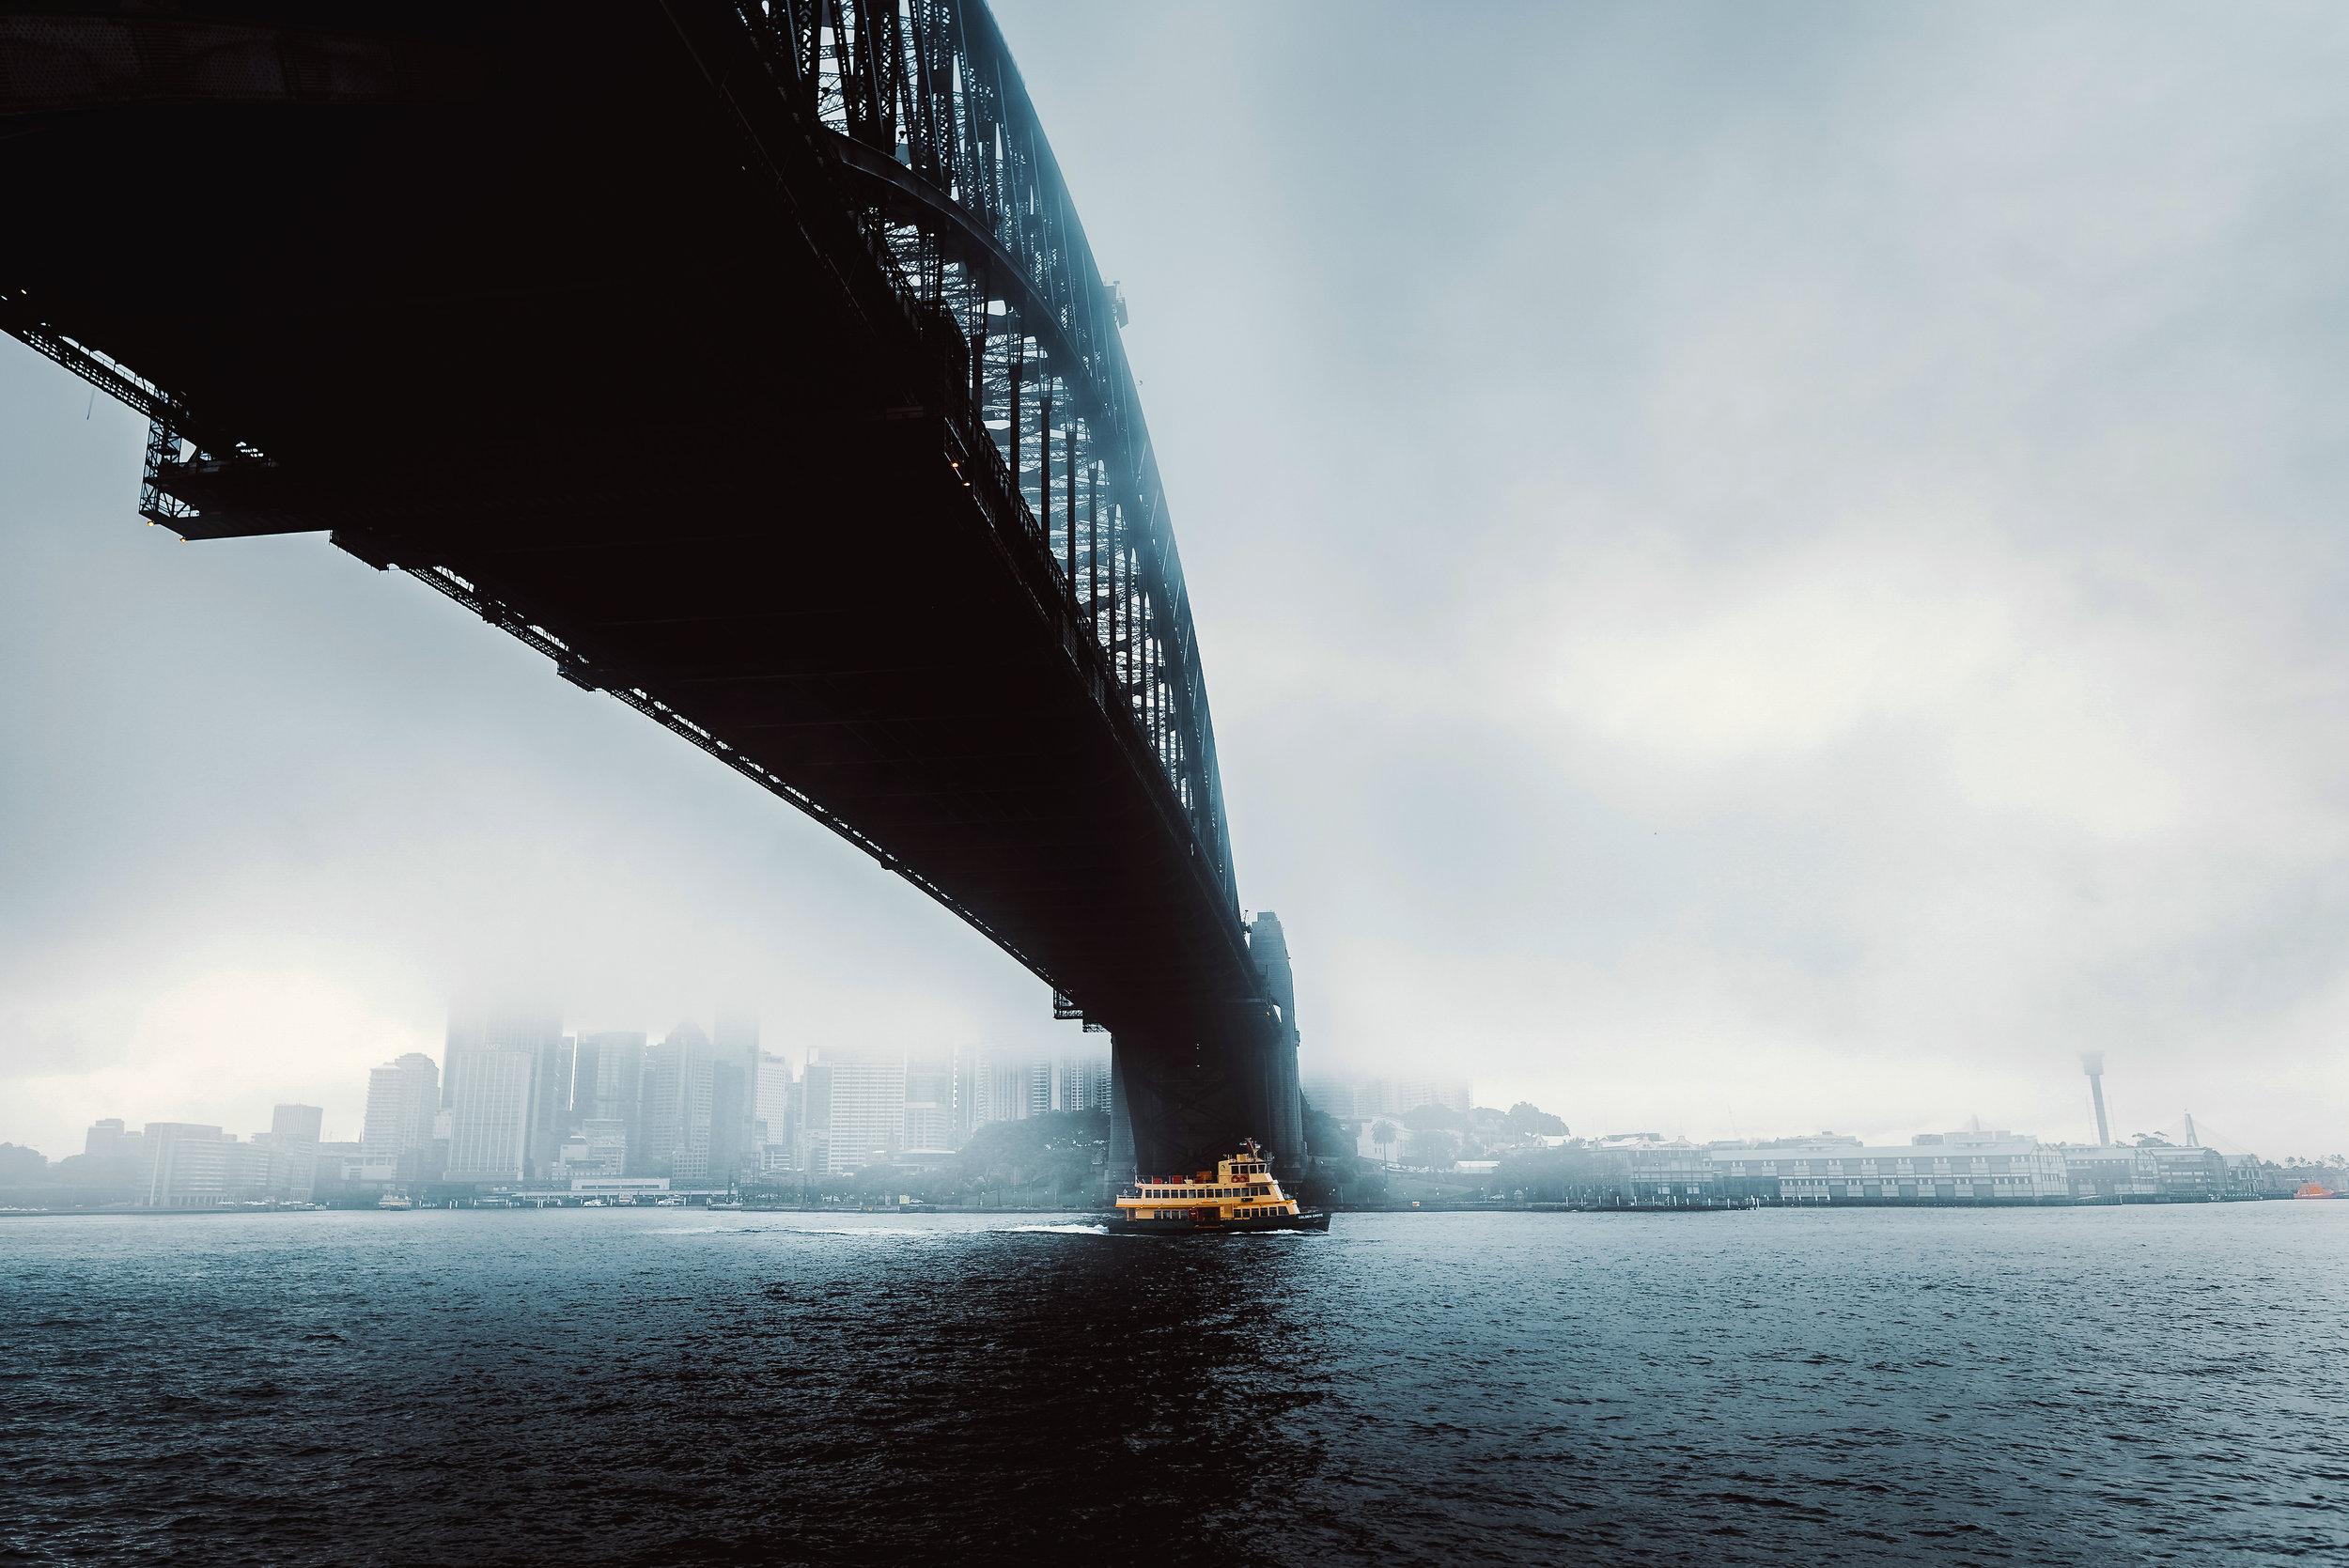 Landscape 01 - Fog in the CBD.jpg